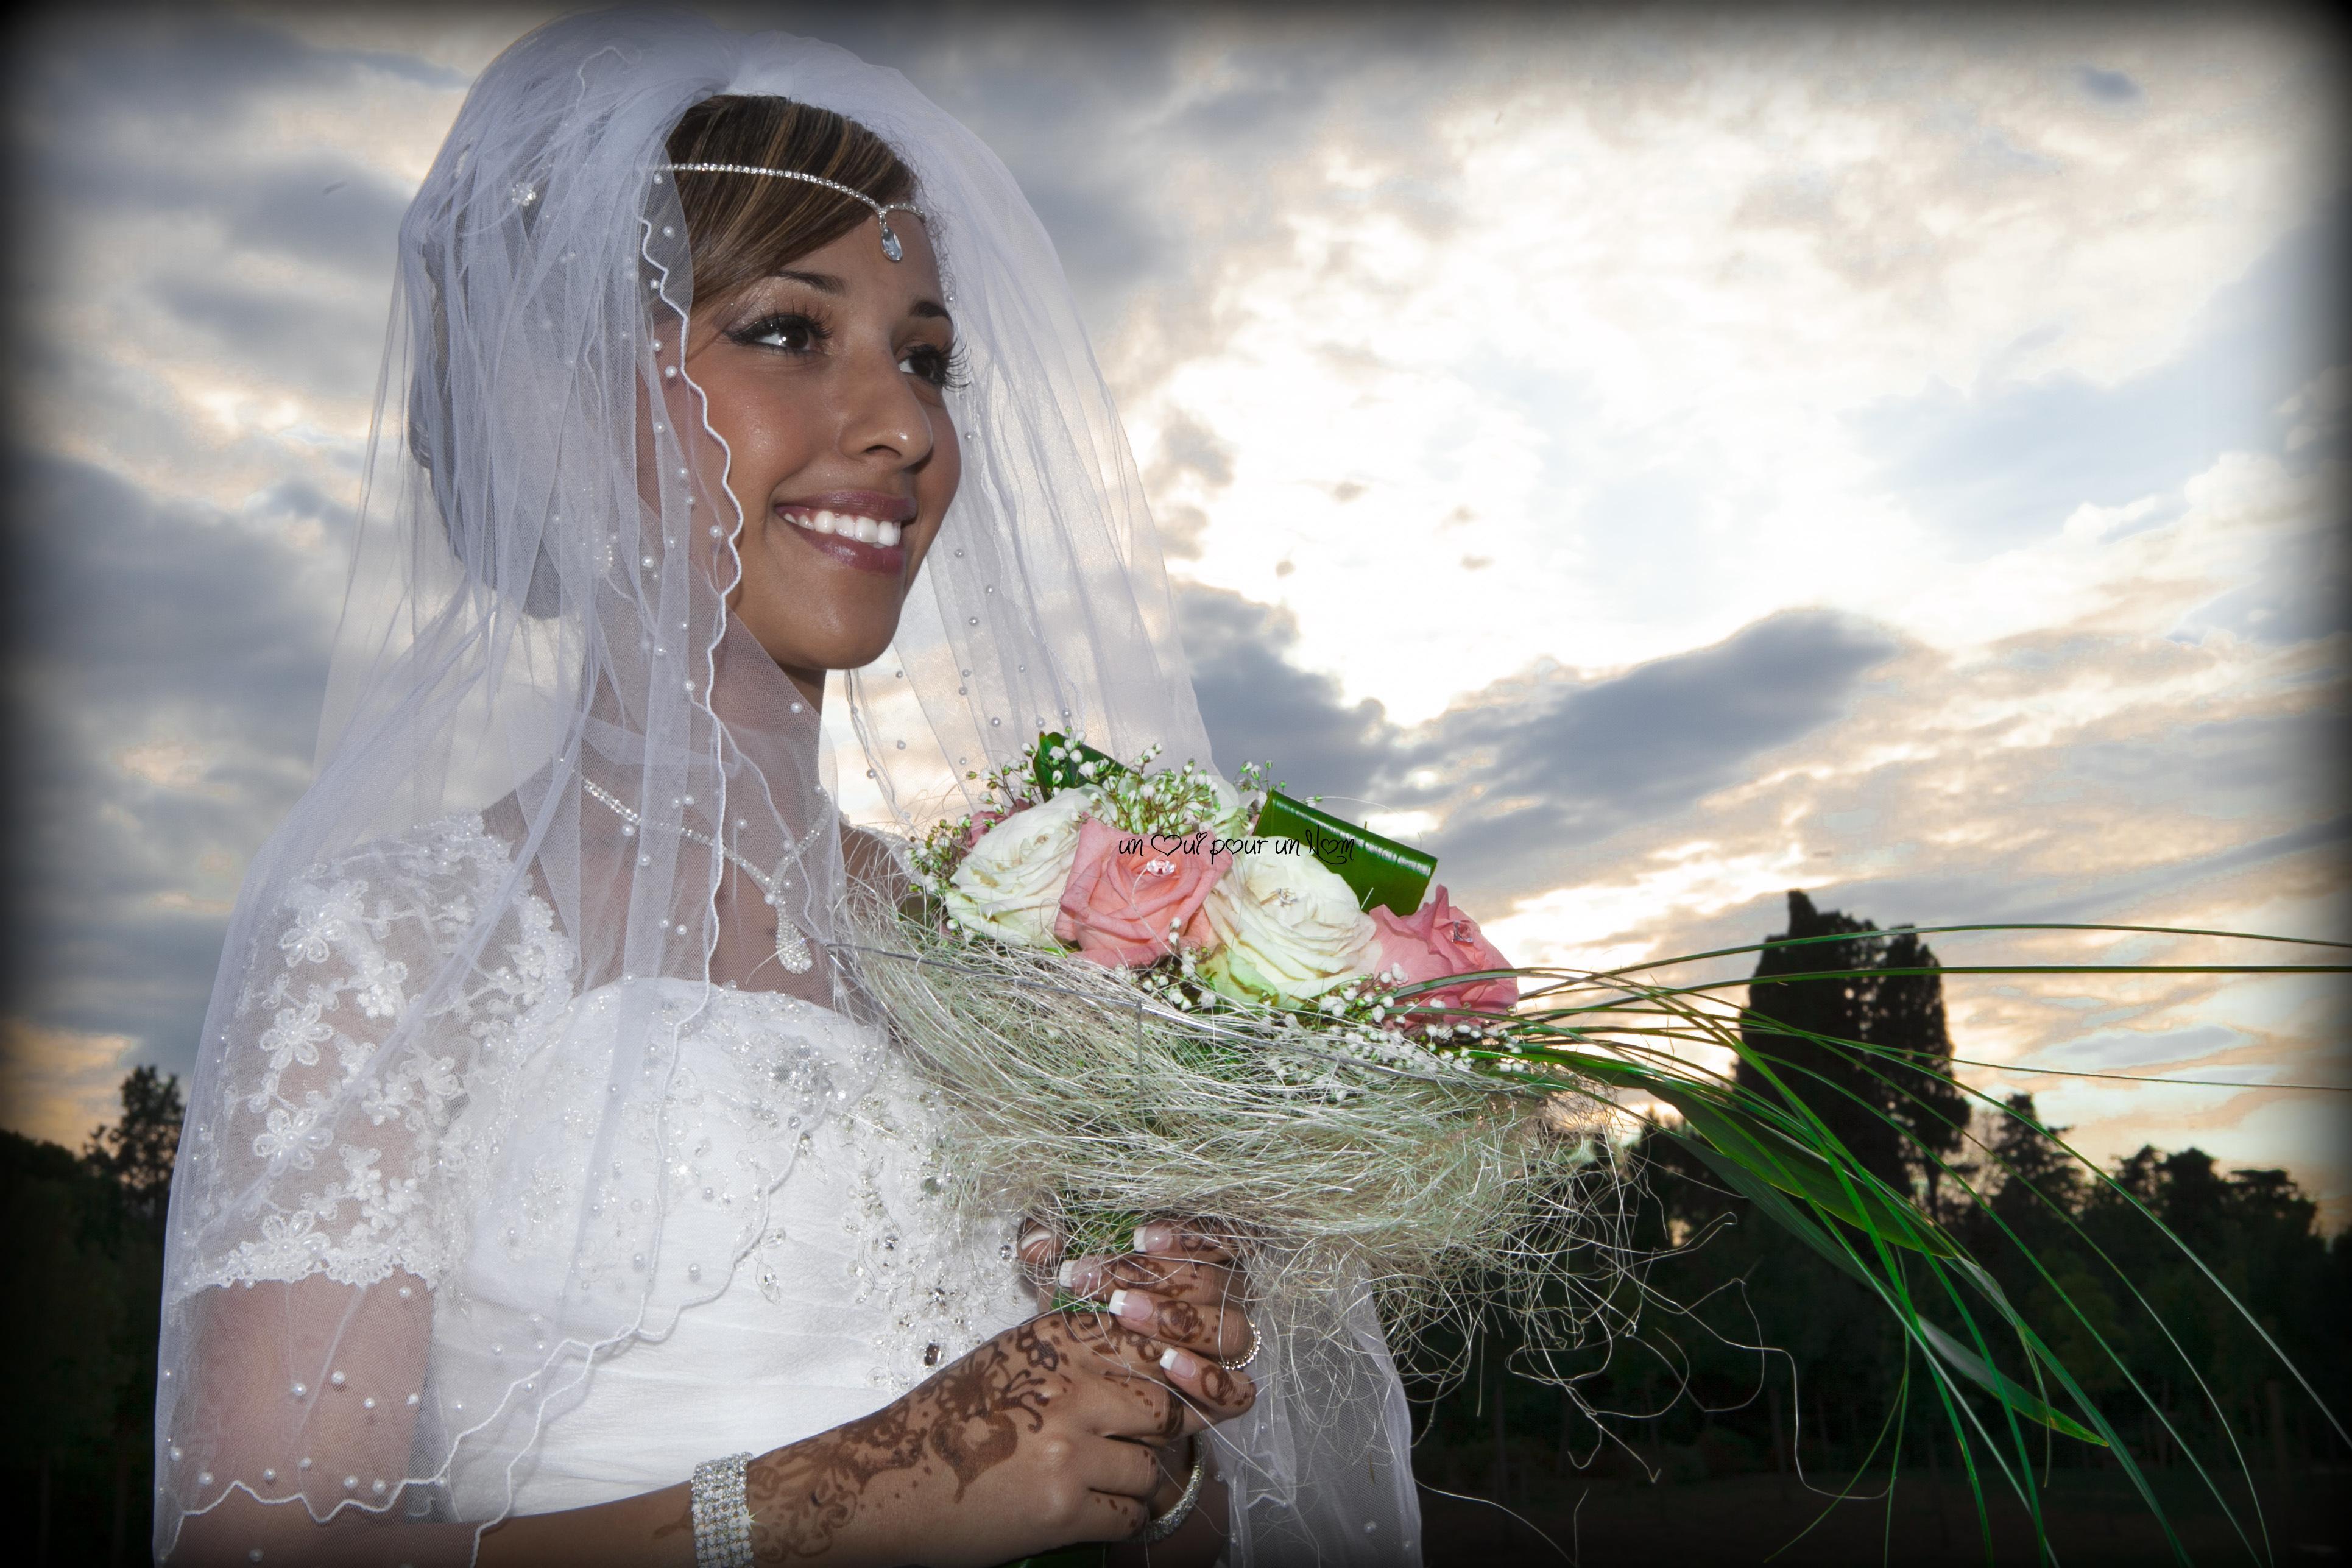 photographe cameraman mariage oriental arabe musulman toulouges - Photographe Mariage Oriental